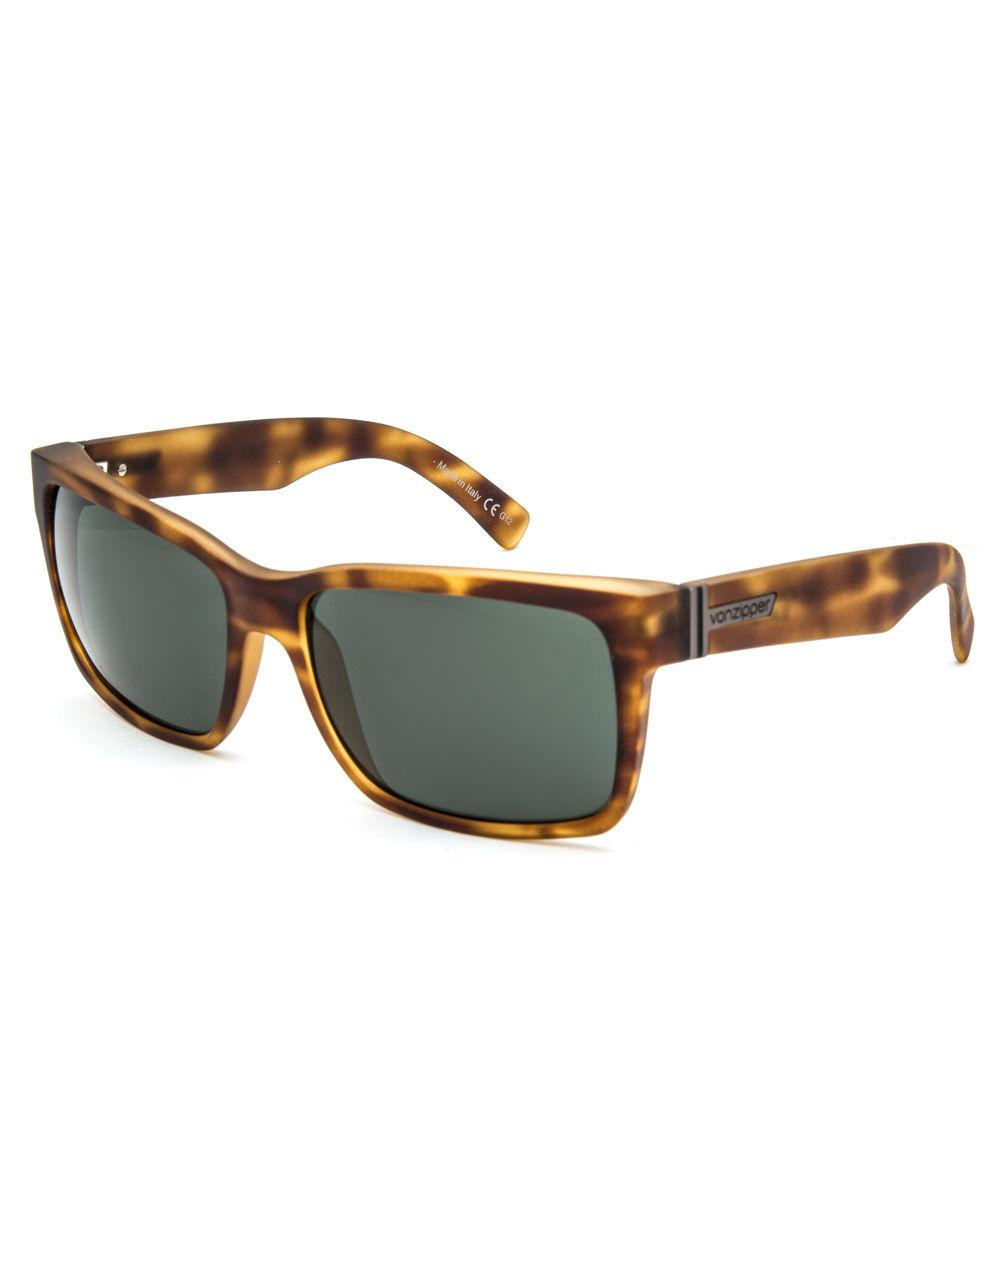 1b6ce8a20b Lyst - Von Zipper Elmore Tortoise Satin   Vintage Grey Sunglasses in ...